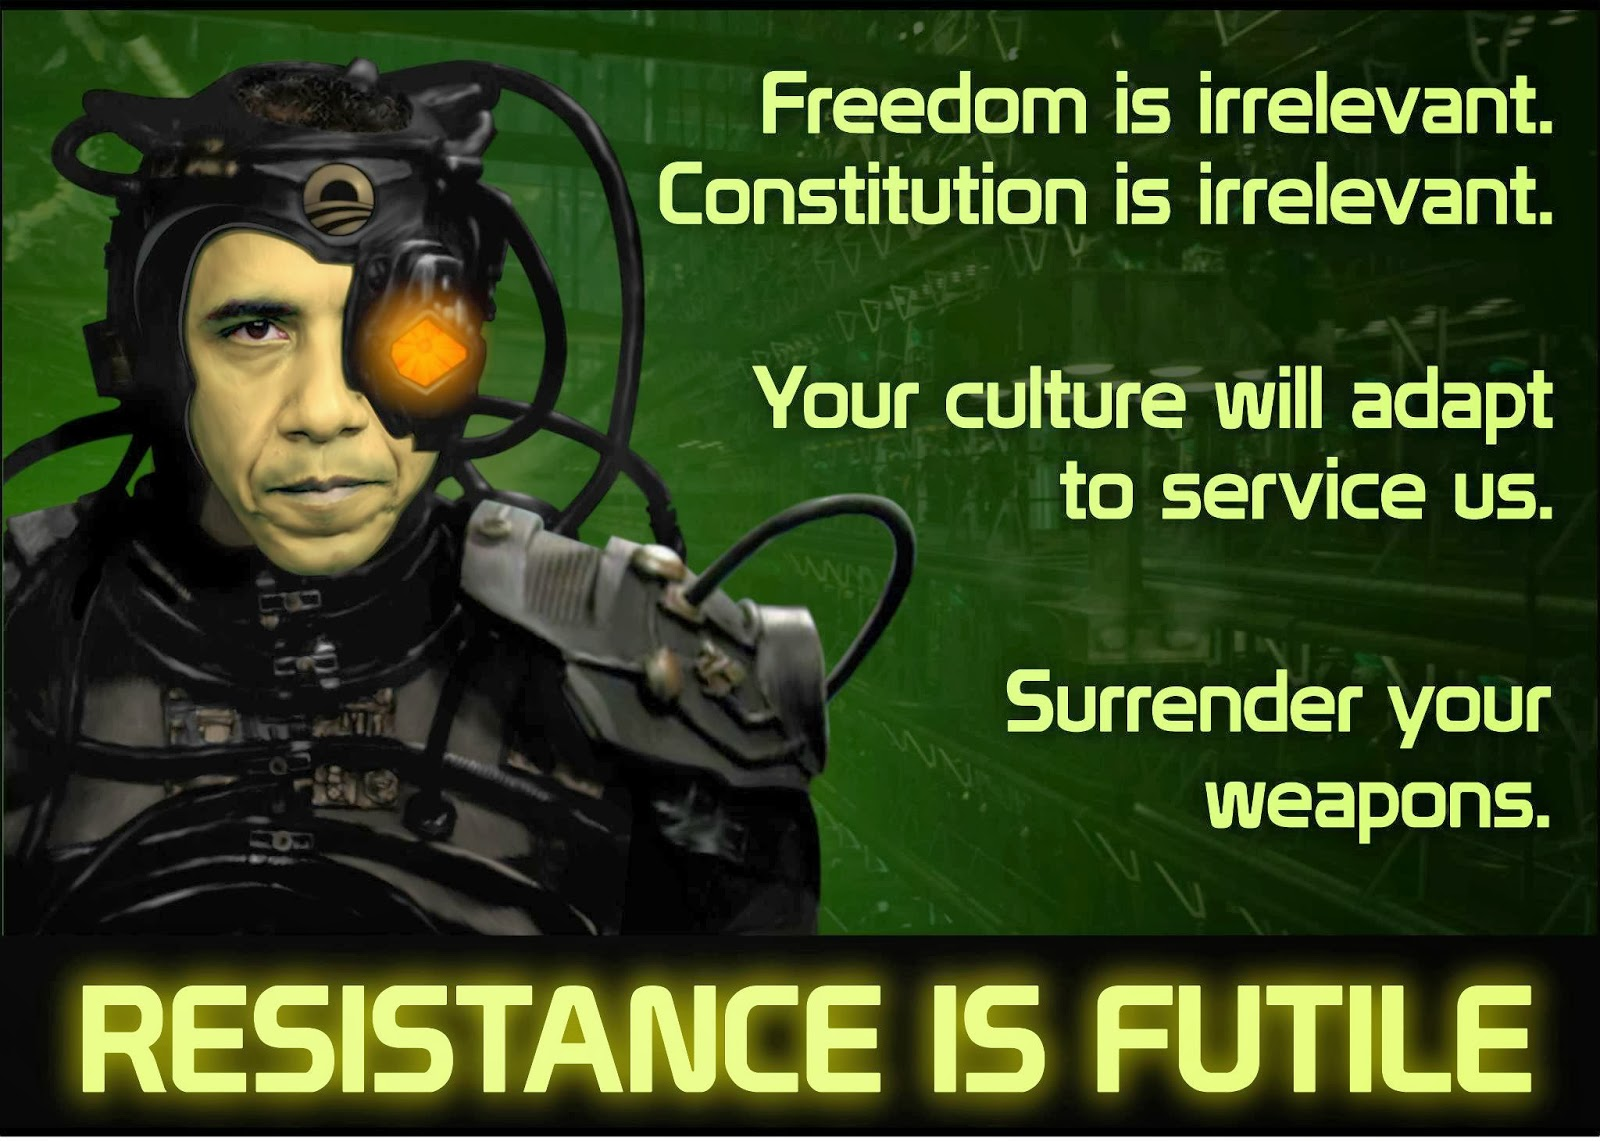 Obama-Borg.jpg